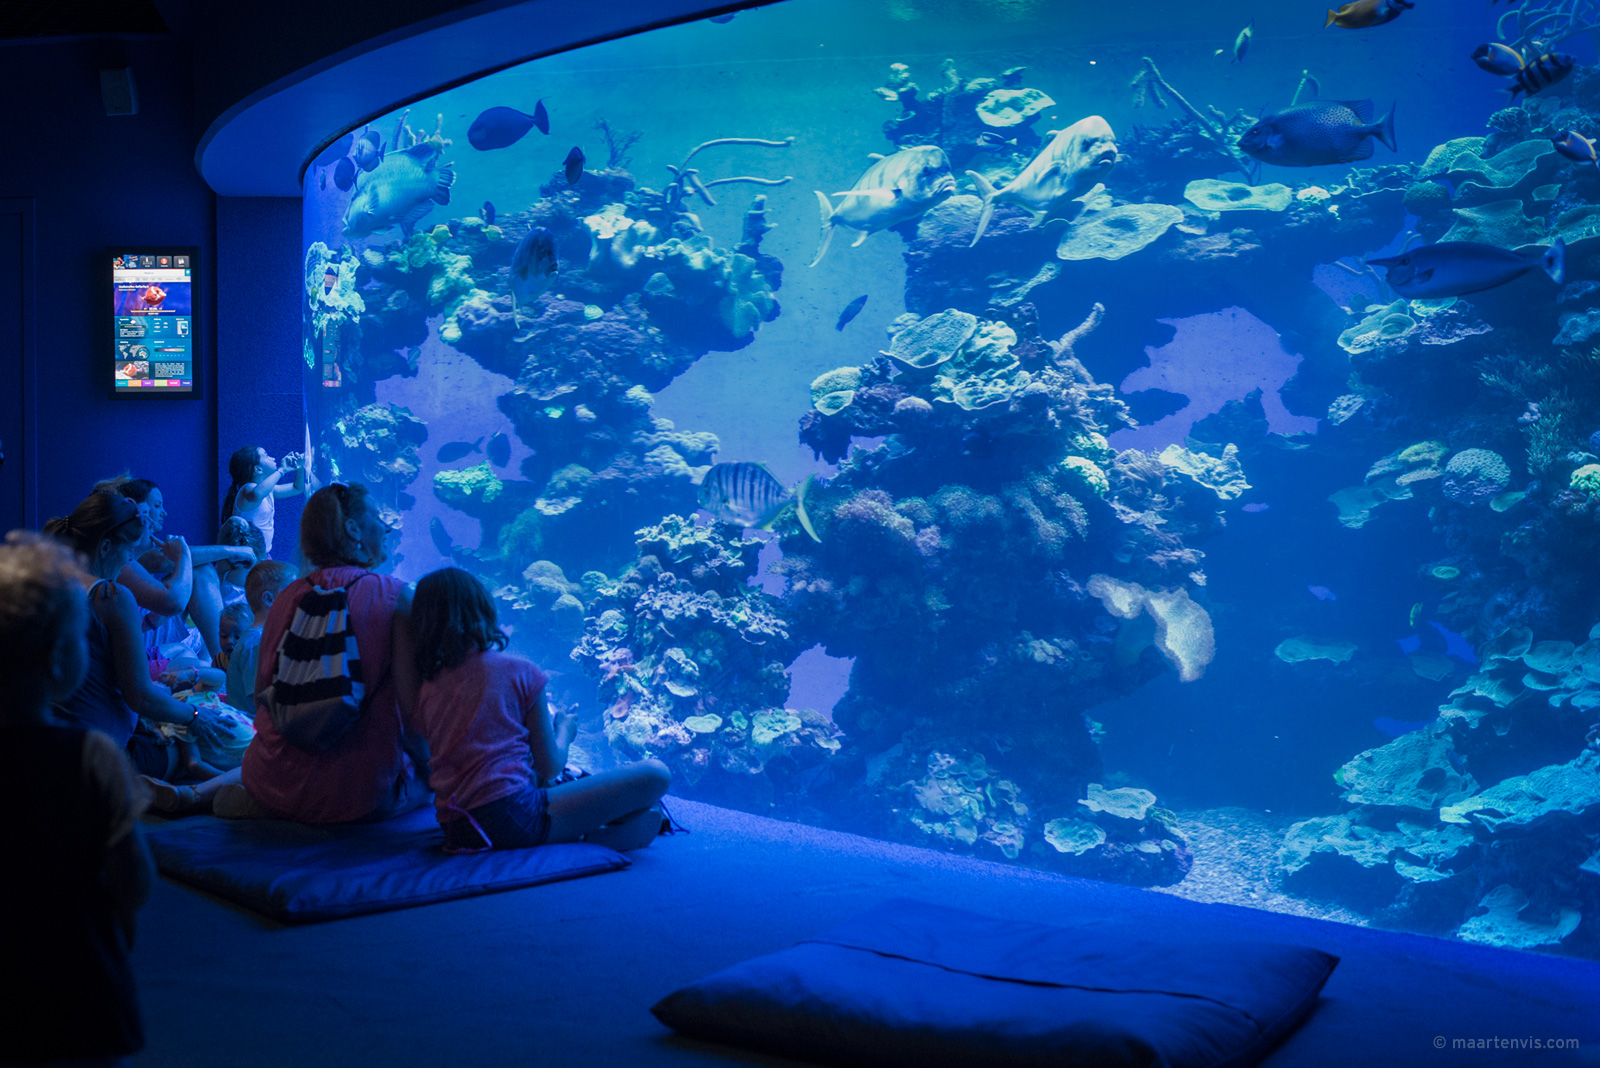 A family friendly trip to the Palma Aquarium on Mallorca.